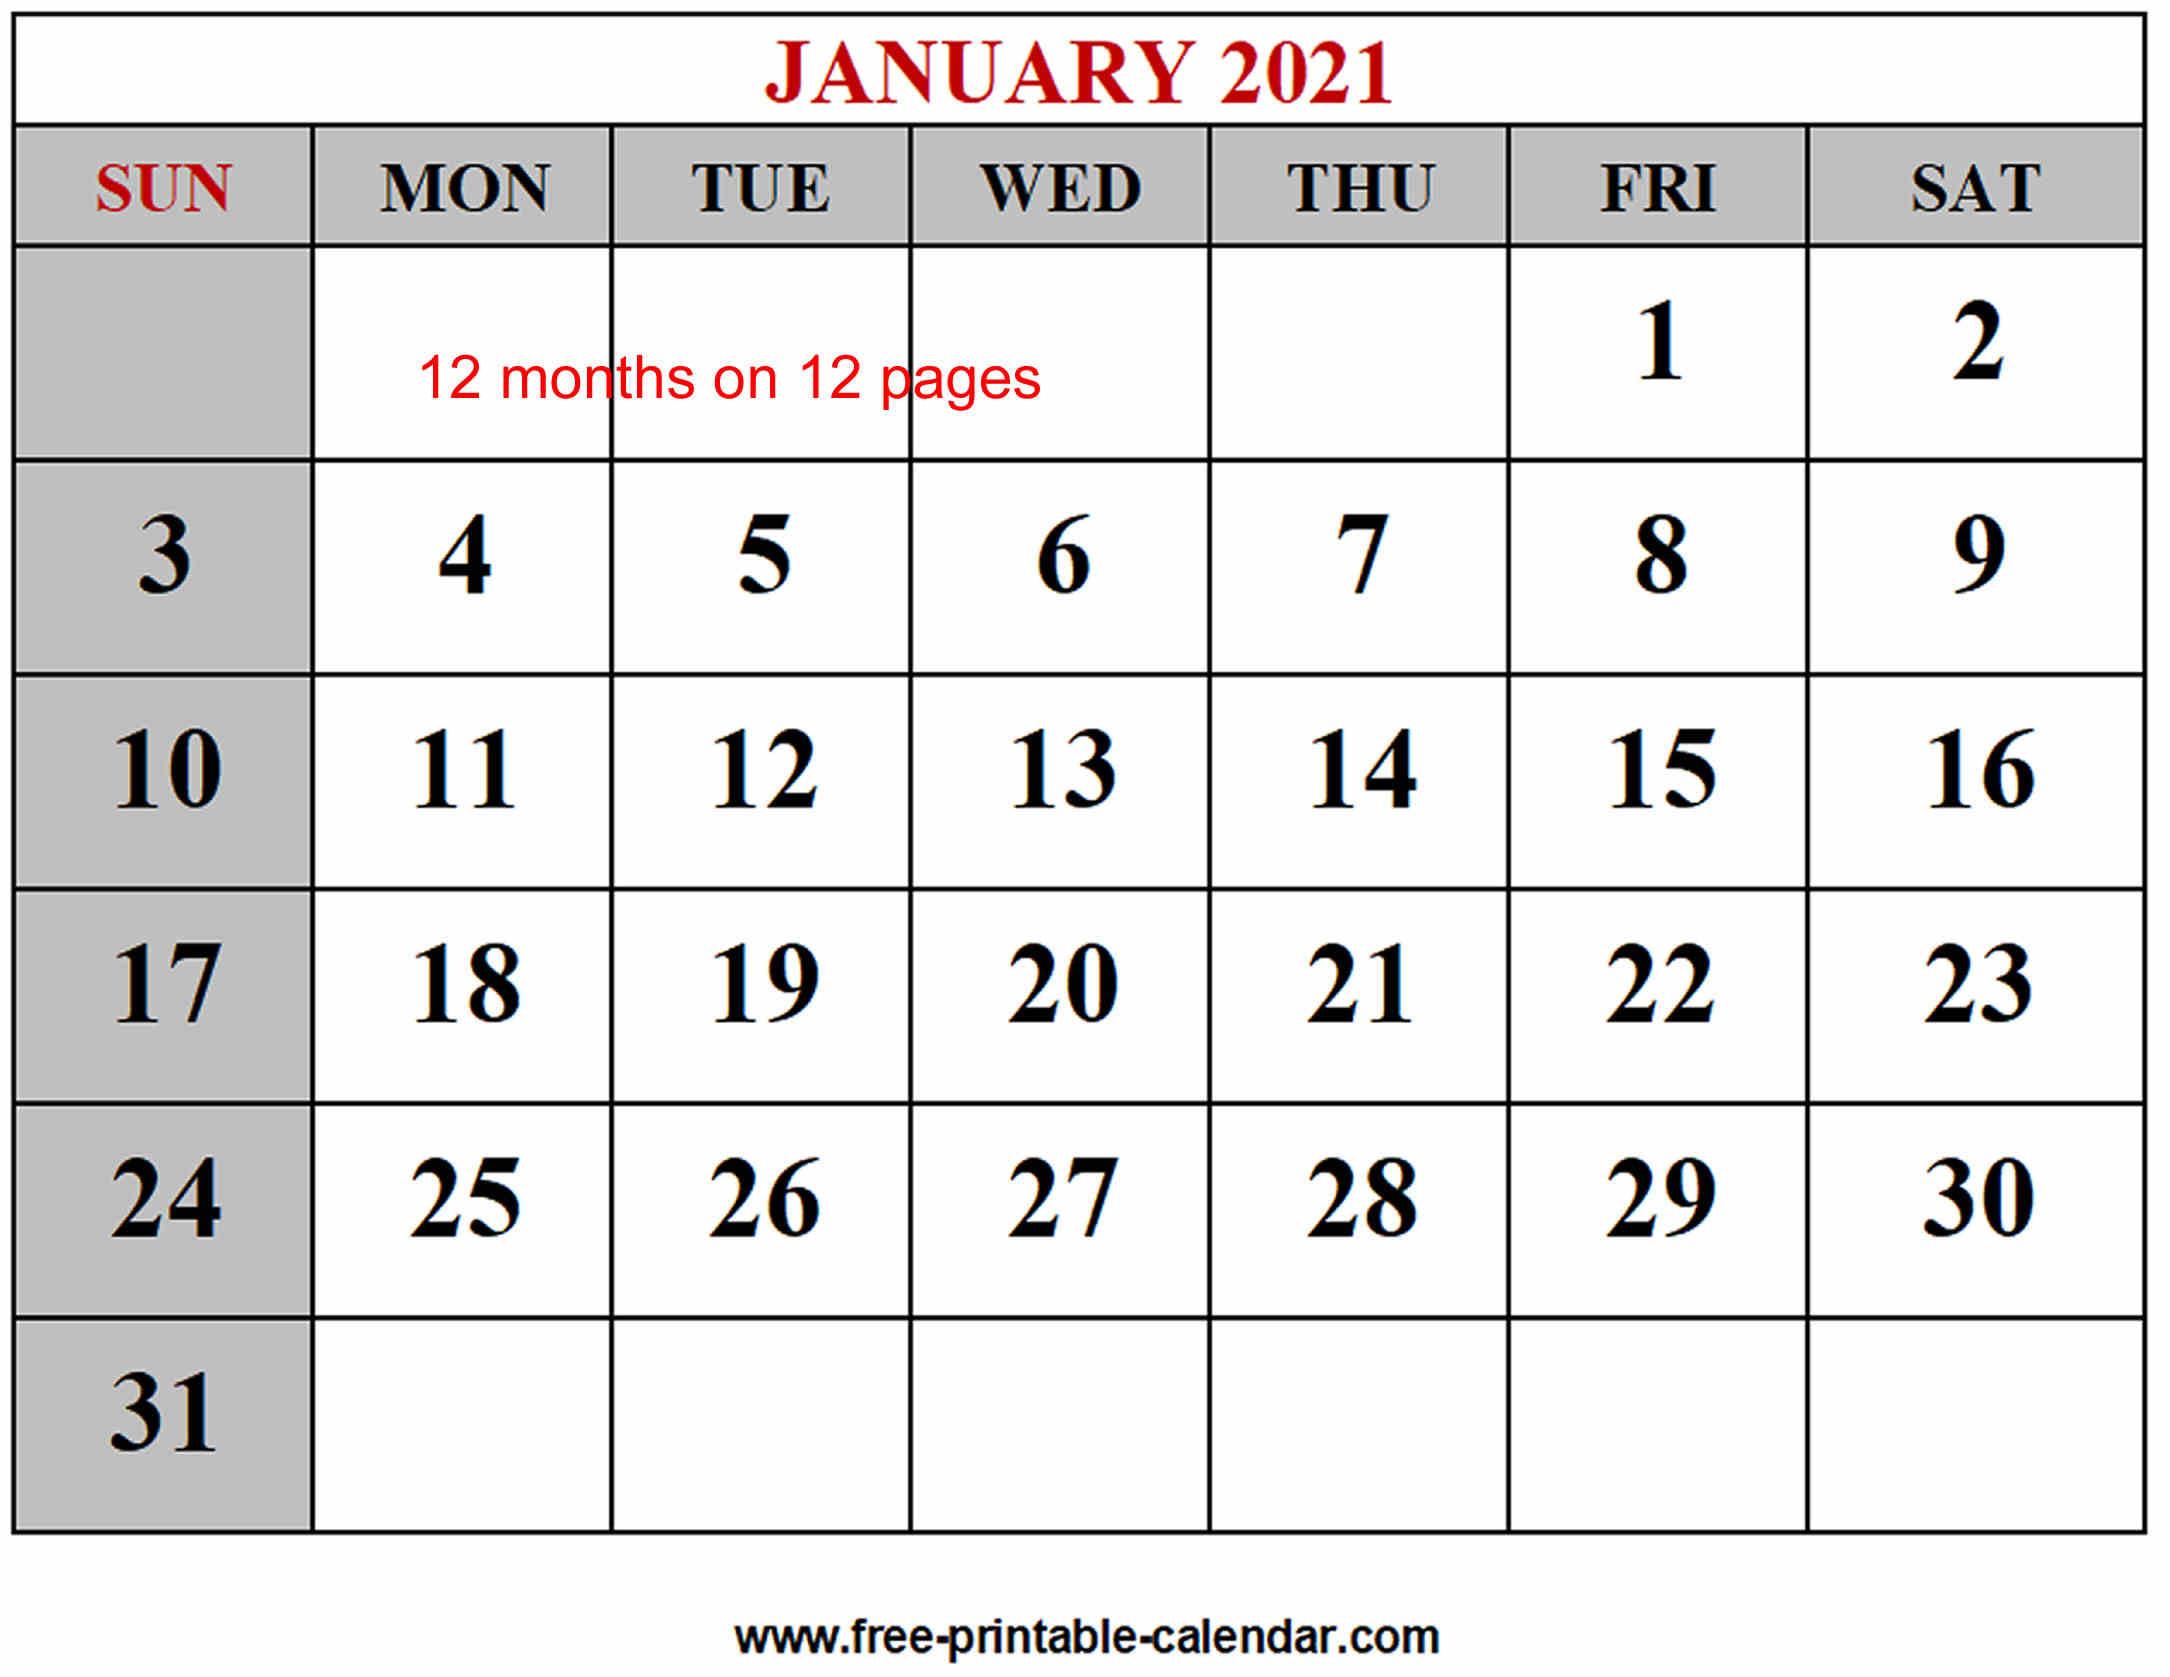 Year 2021 Calendar Templates - Free-Printable-Calendar